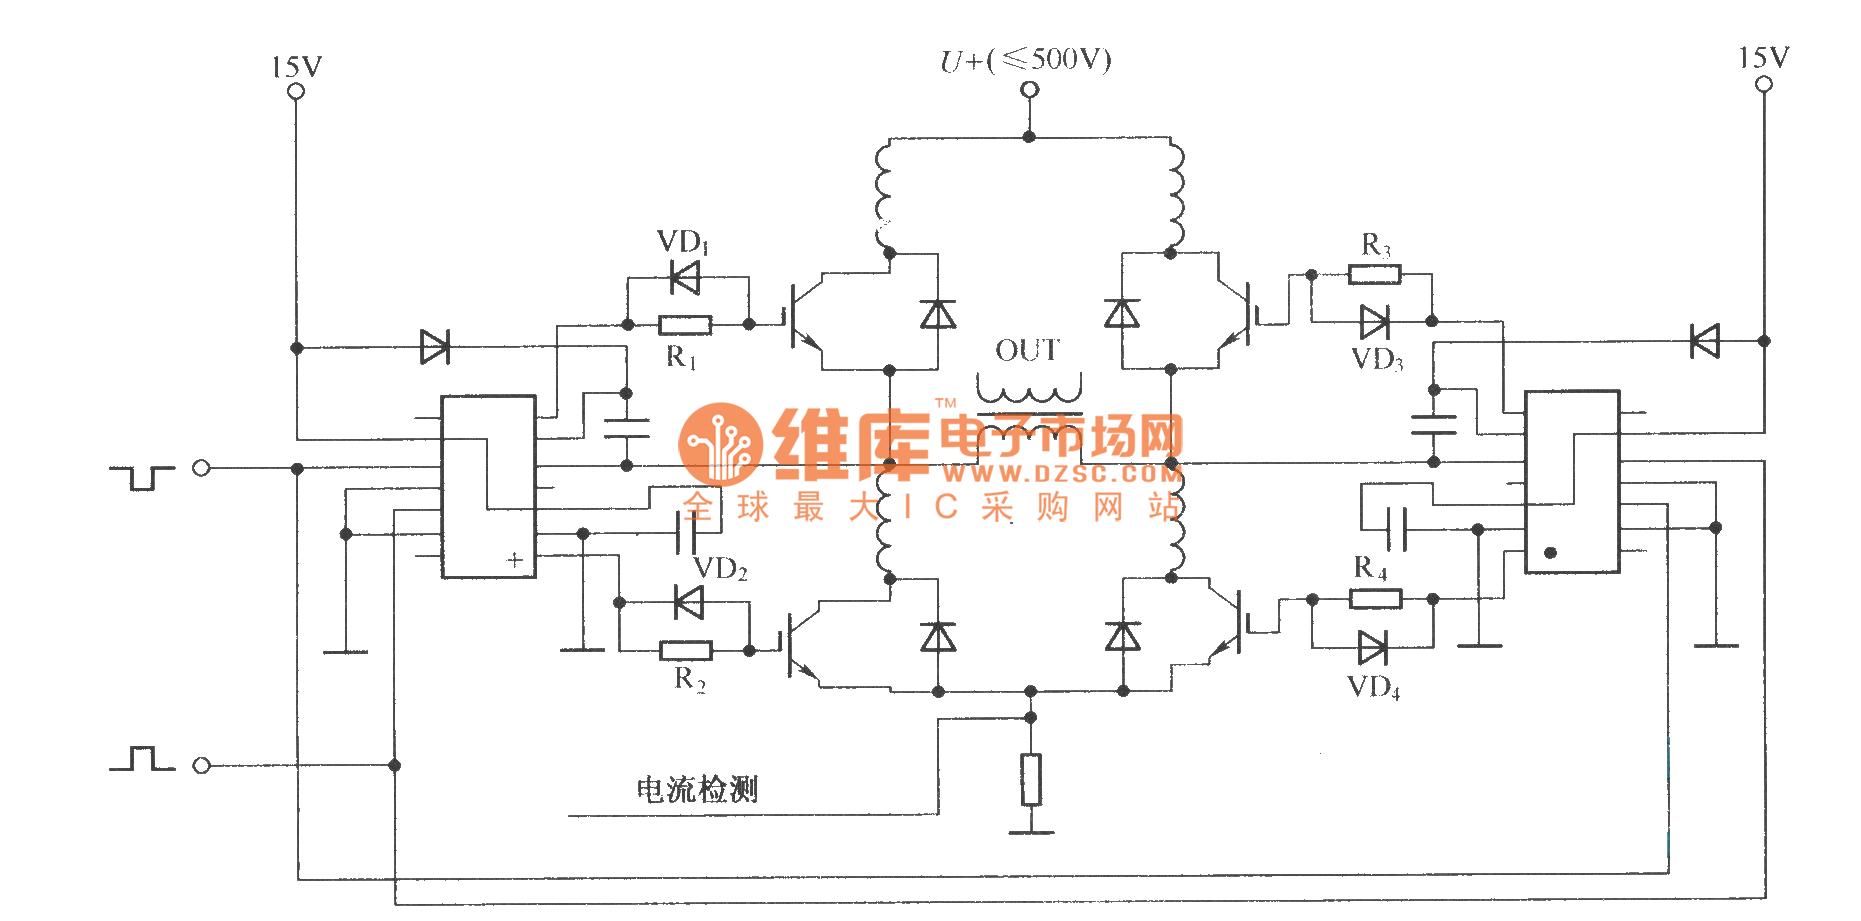 Temperature Control Fan Circuit Diagram. on light sensor circuit #BA4A11